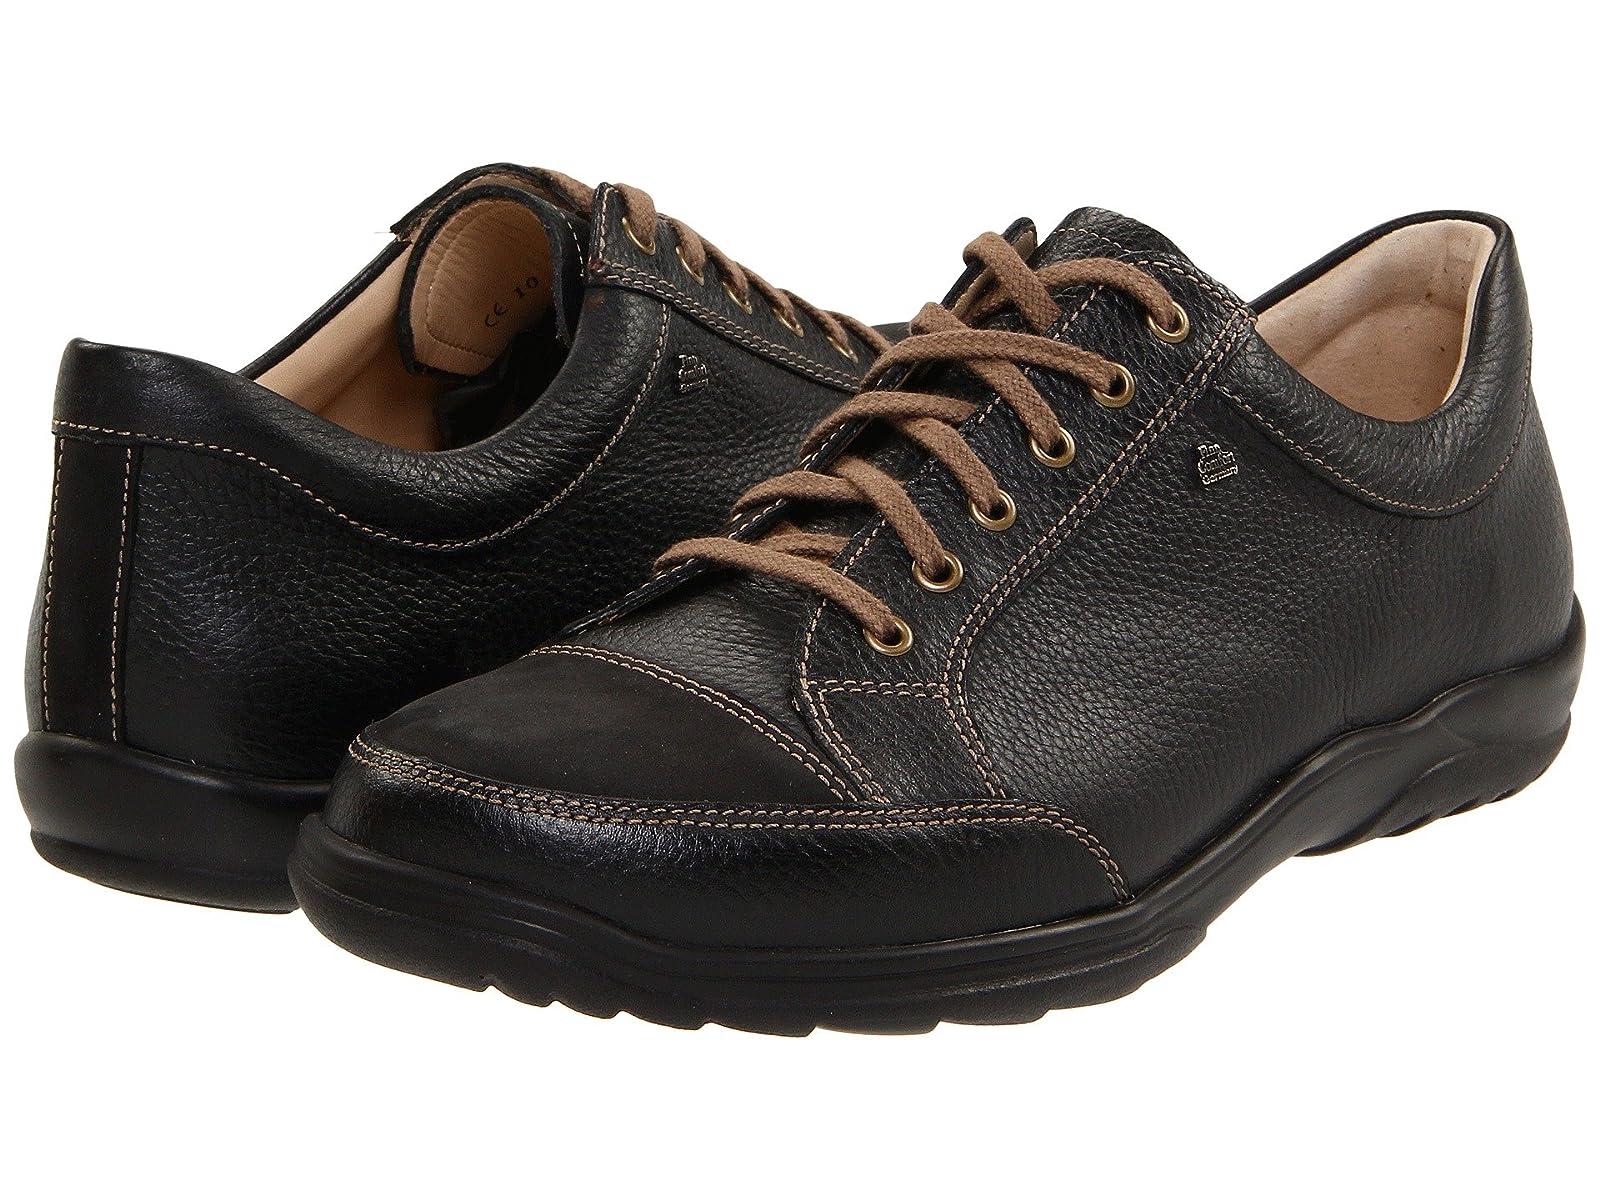 Finn Comfort Alamo - 1288Atmospheric grades have affordable shoes